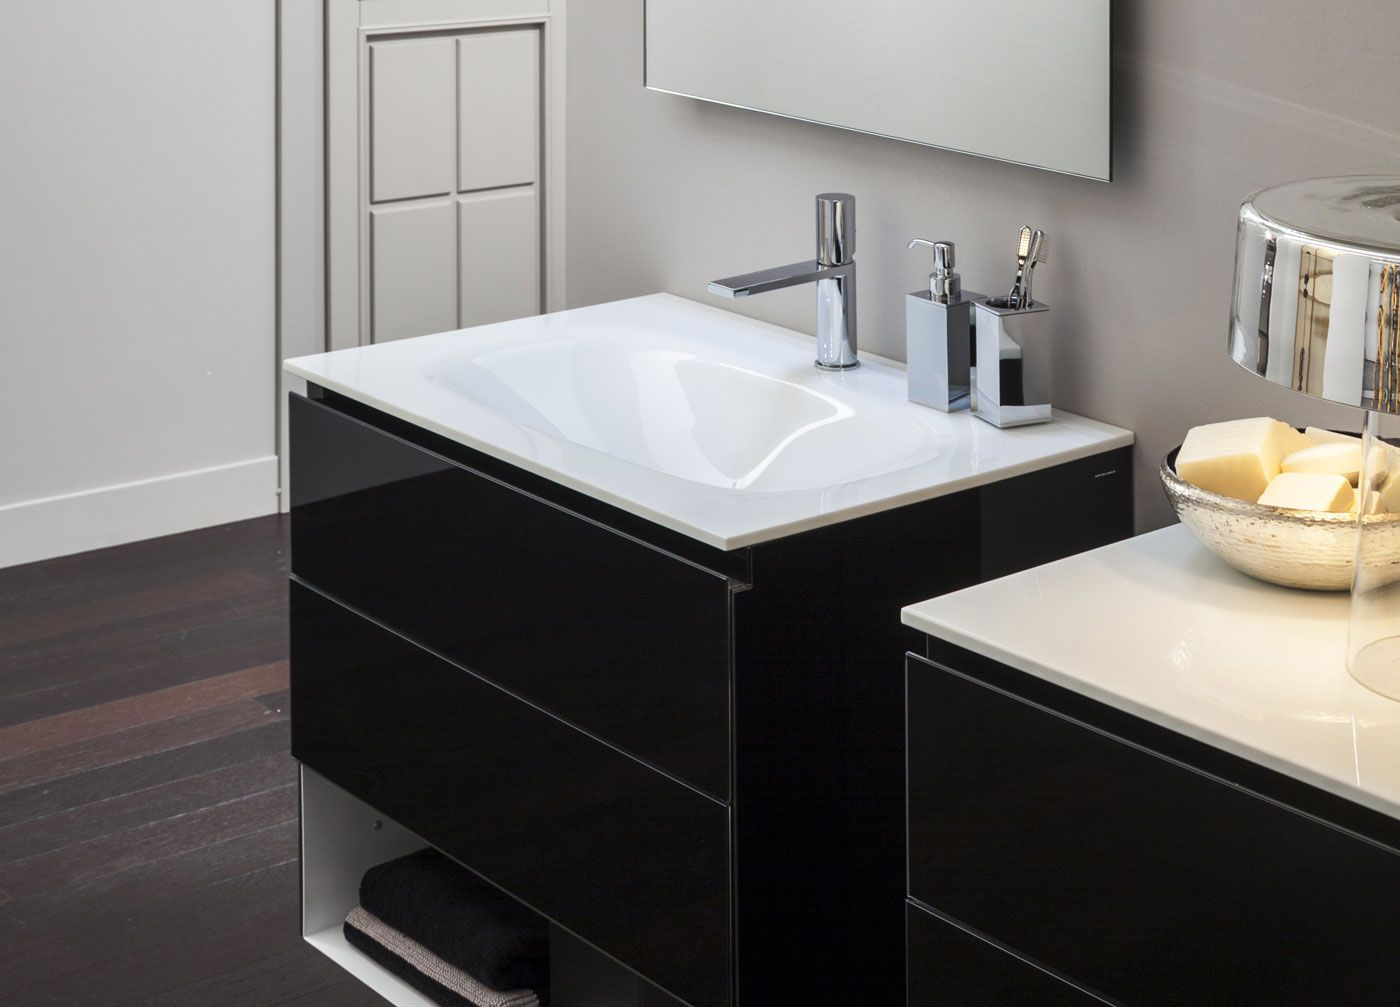 Artelinea Bagno ~ Artelinea s modern wall mount bath vanity vero collection